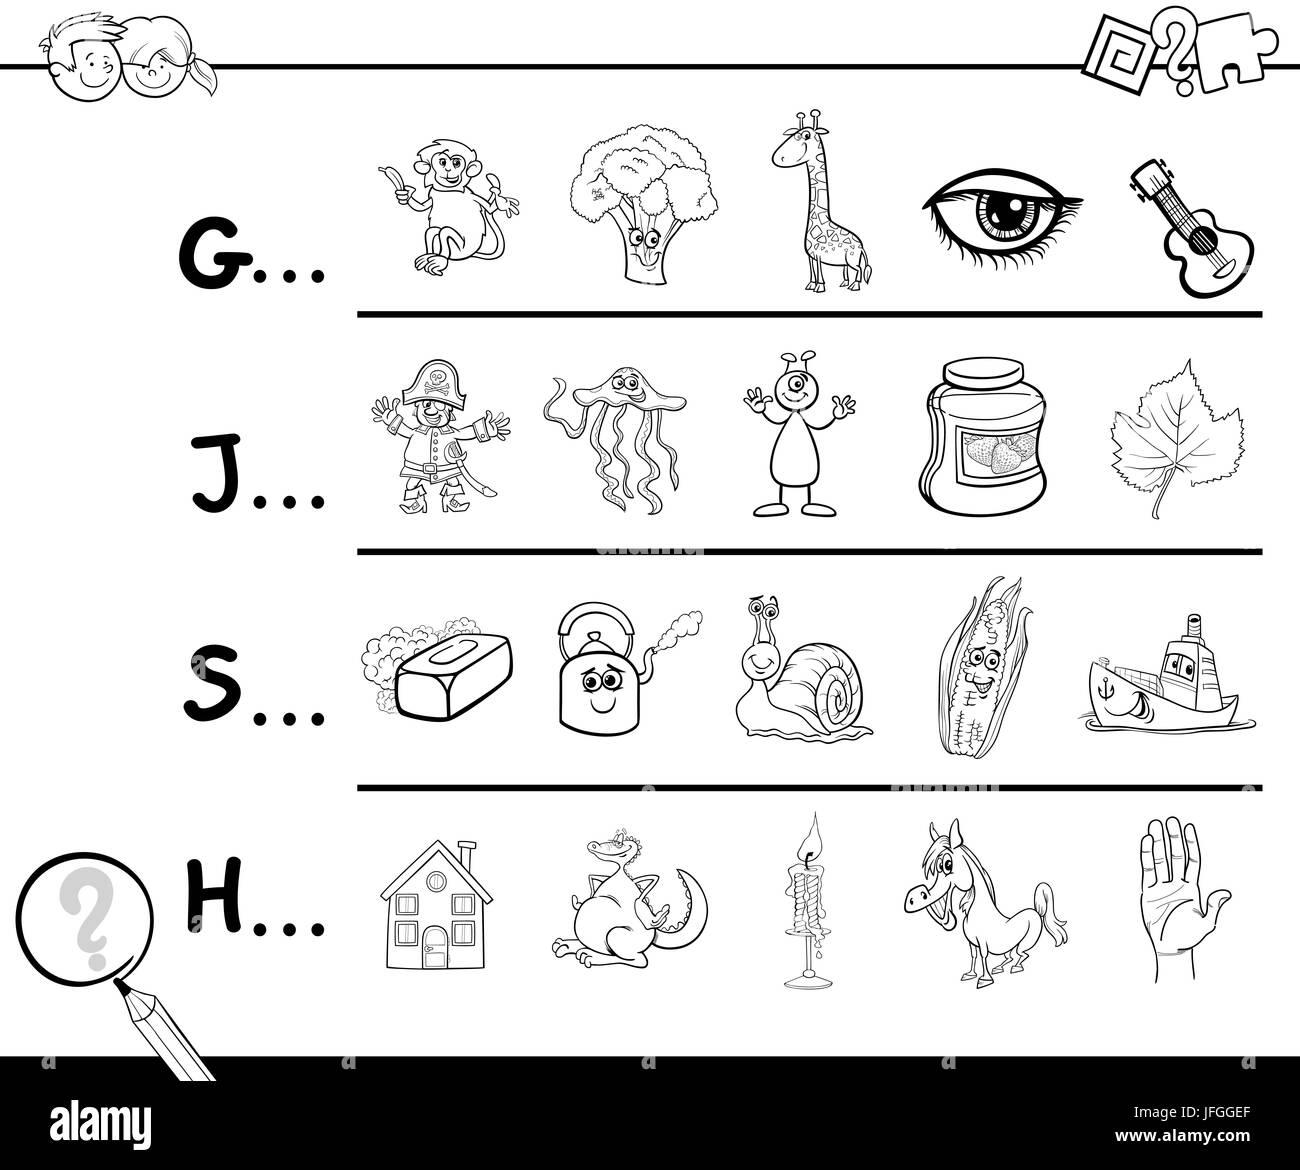 Cartoon Letter H Stockfotos & Cartoon Letter H Bilder - Alamy